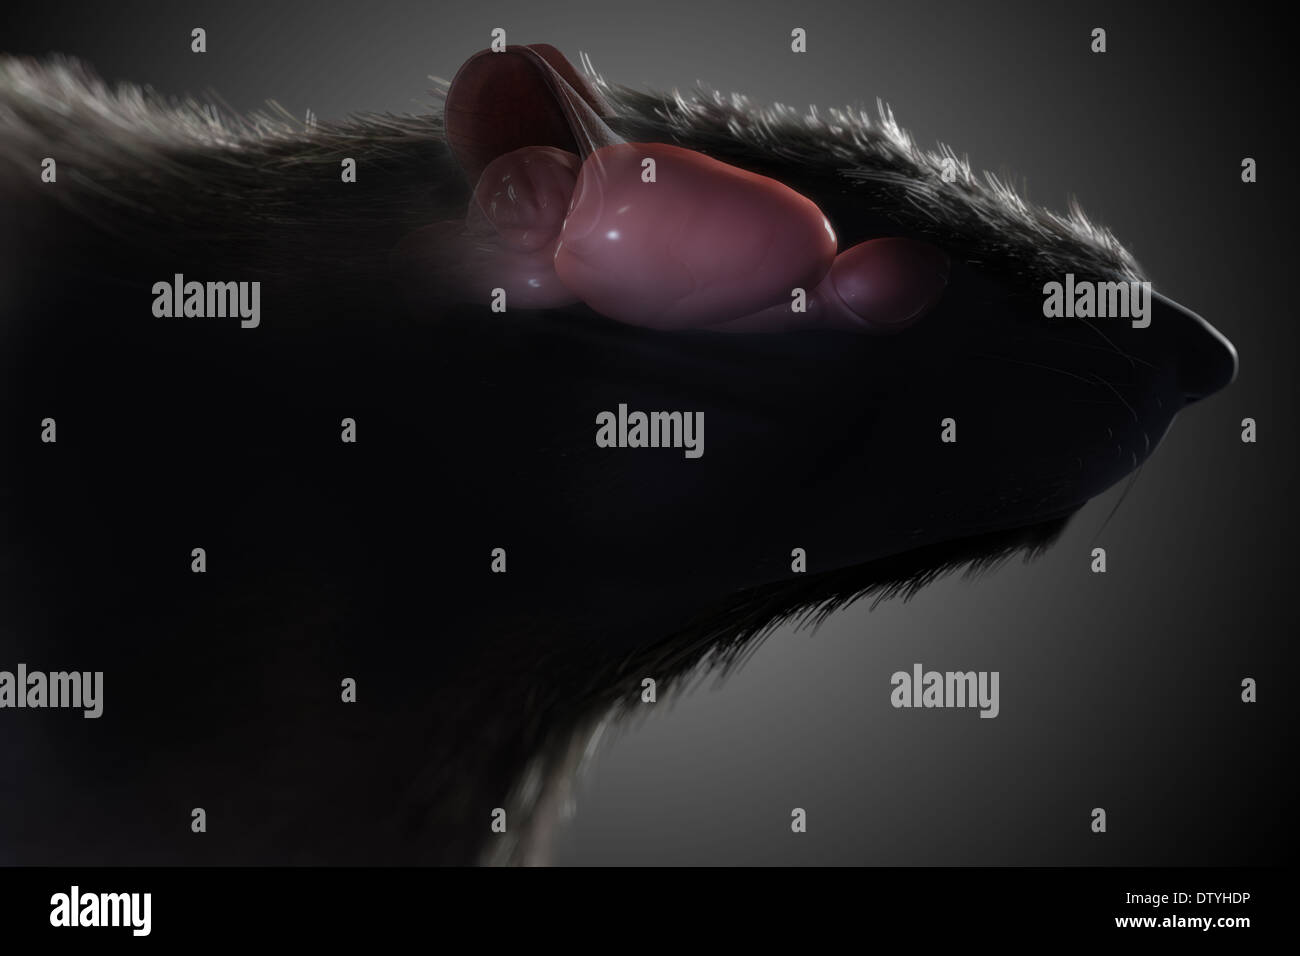 Anatomie des Gehirns Ratte Stockfoto, Bild: 66989266 - Alamy